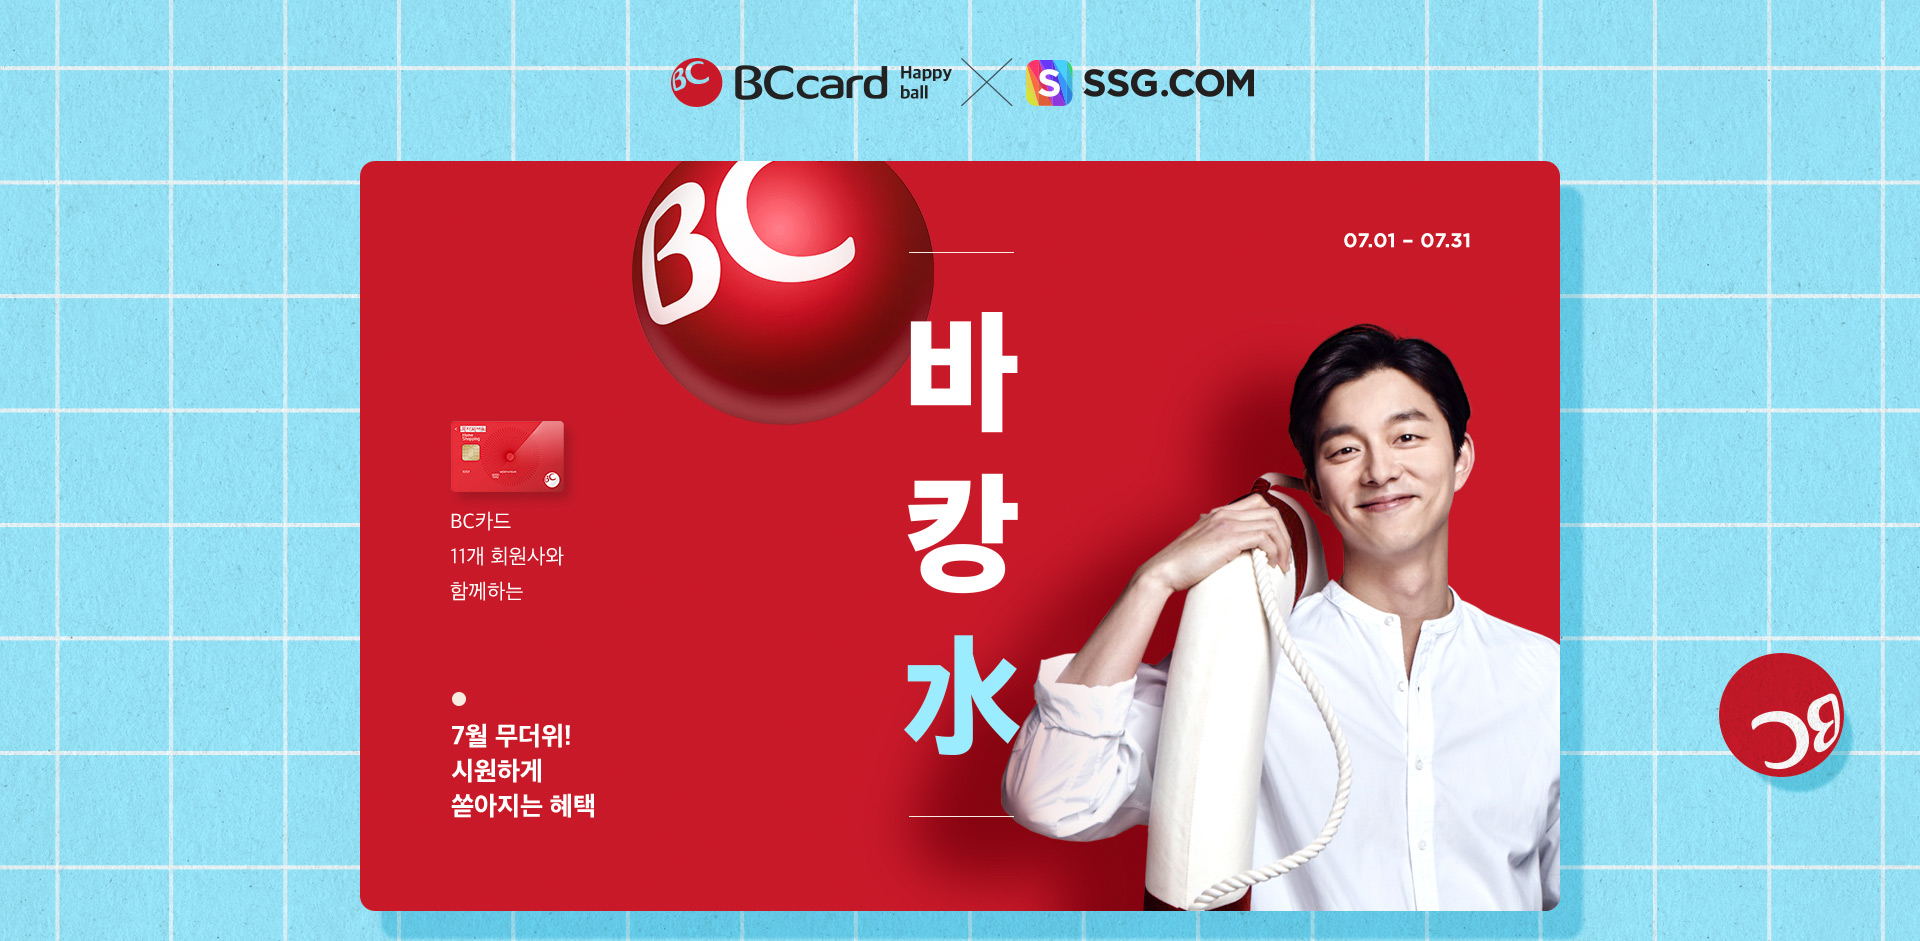 SSG.COM과 BC카드 REDBALL 주관